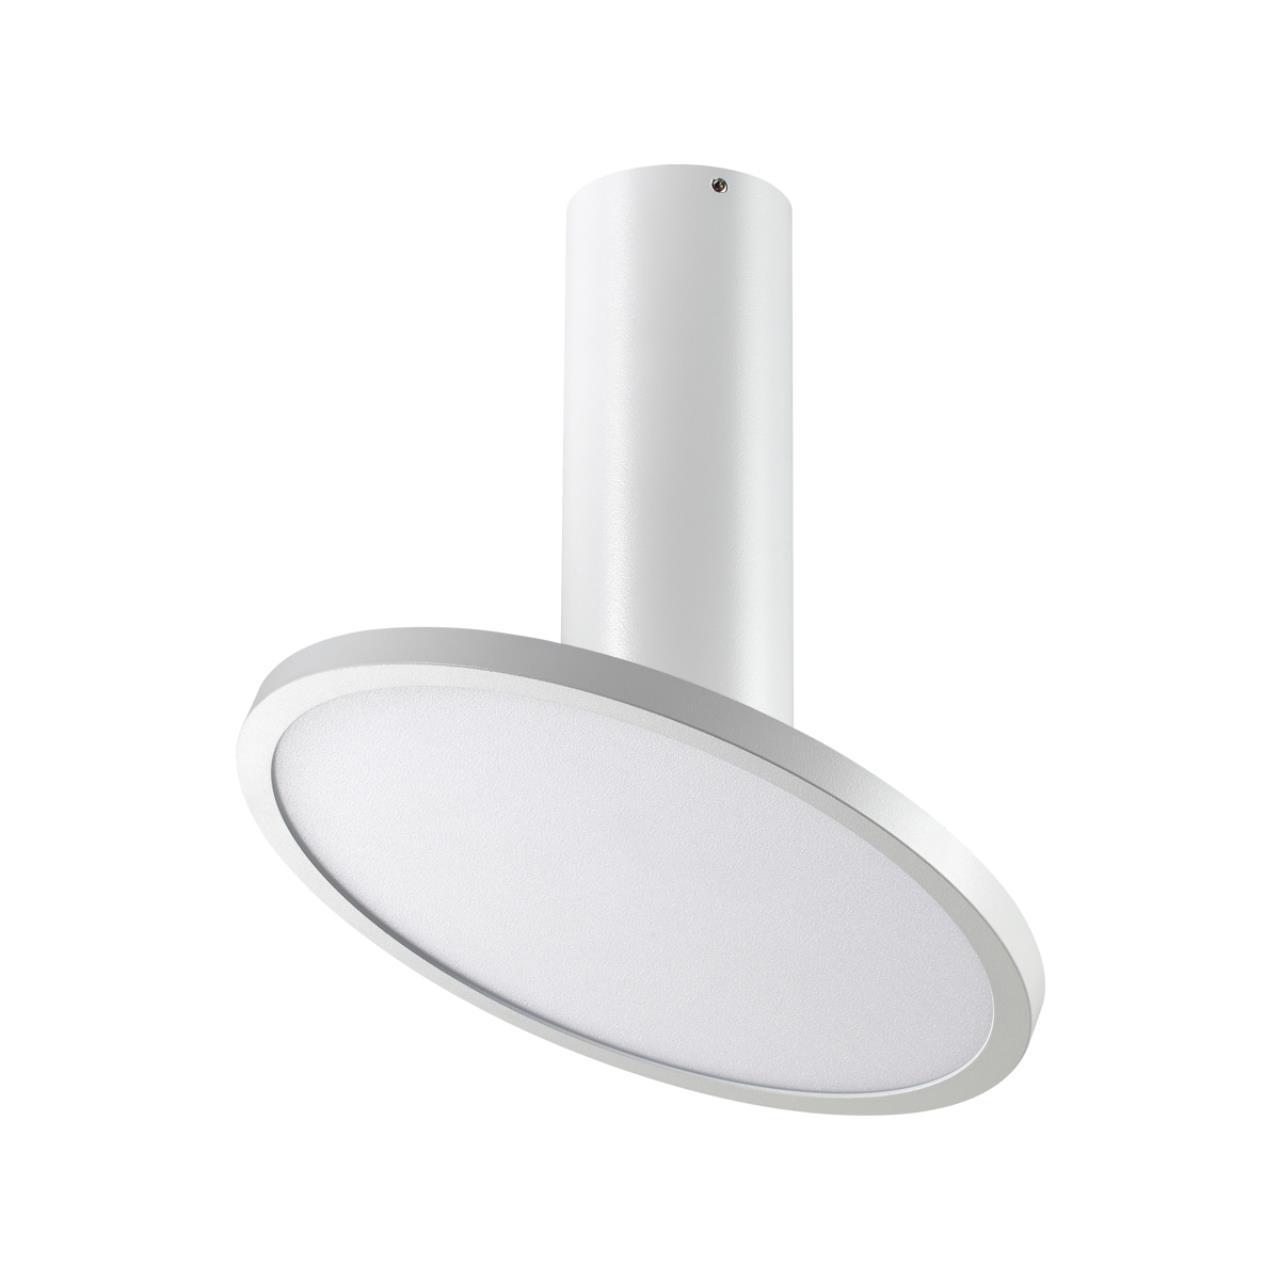 358347 OVER NT20 000 белый Светильник накладной IP20 LED 4000K 18W 85-265V HAT